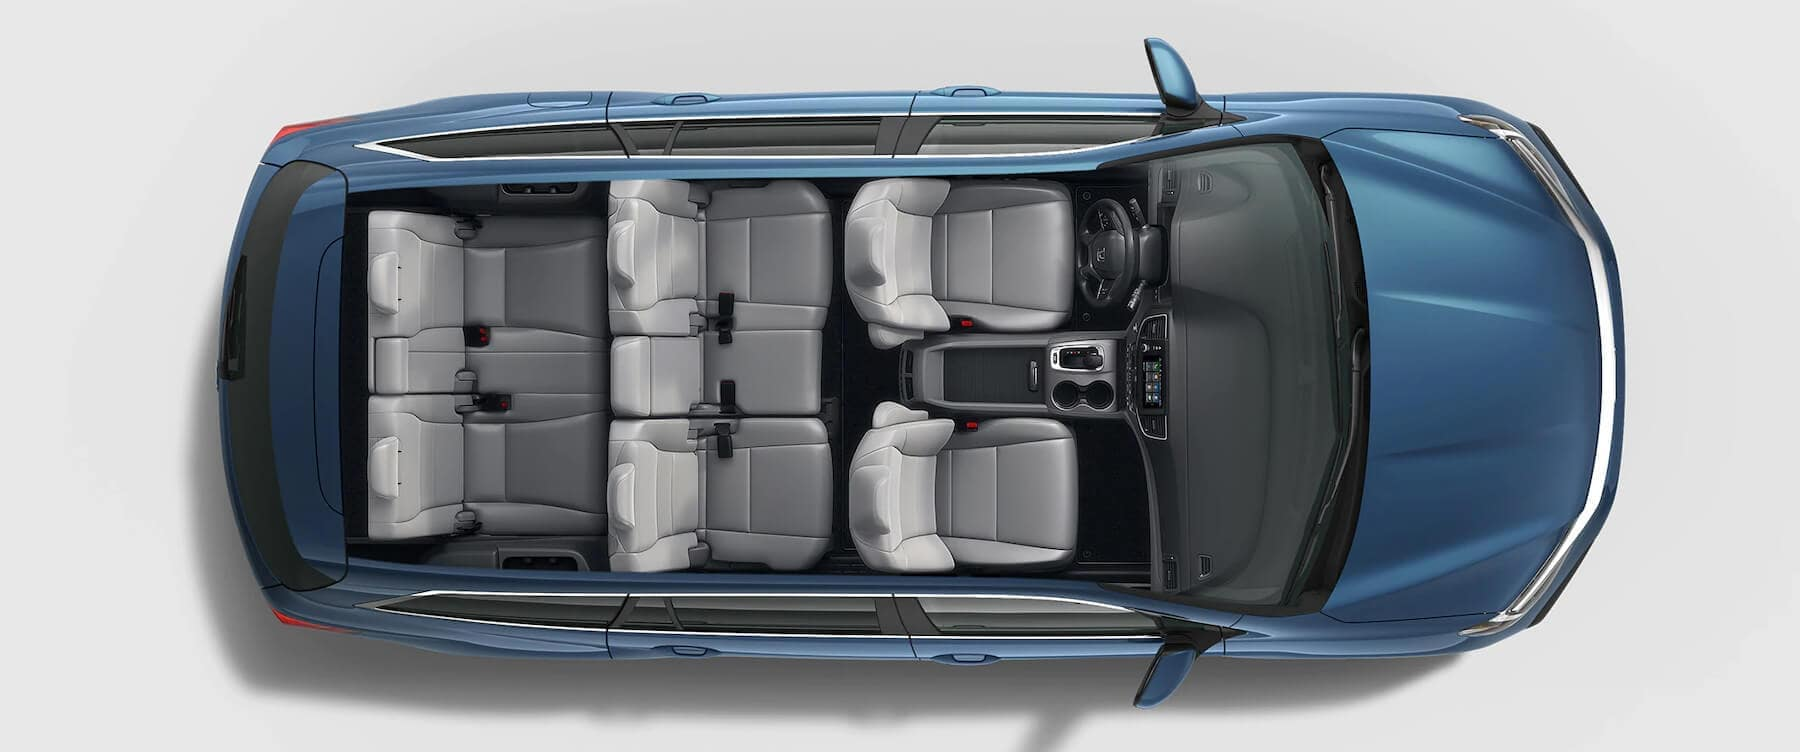 Honda SUV Lineup: 2022 Pilot Slider